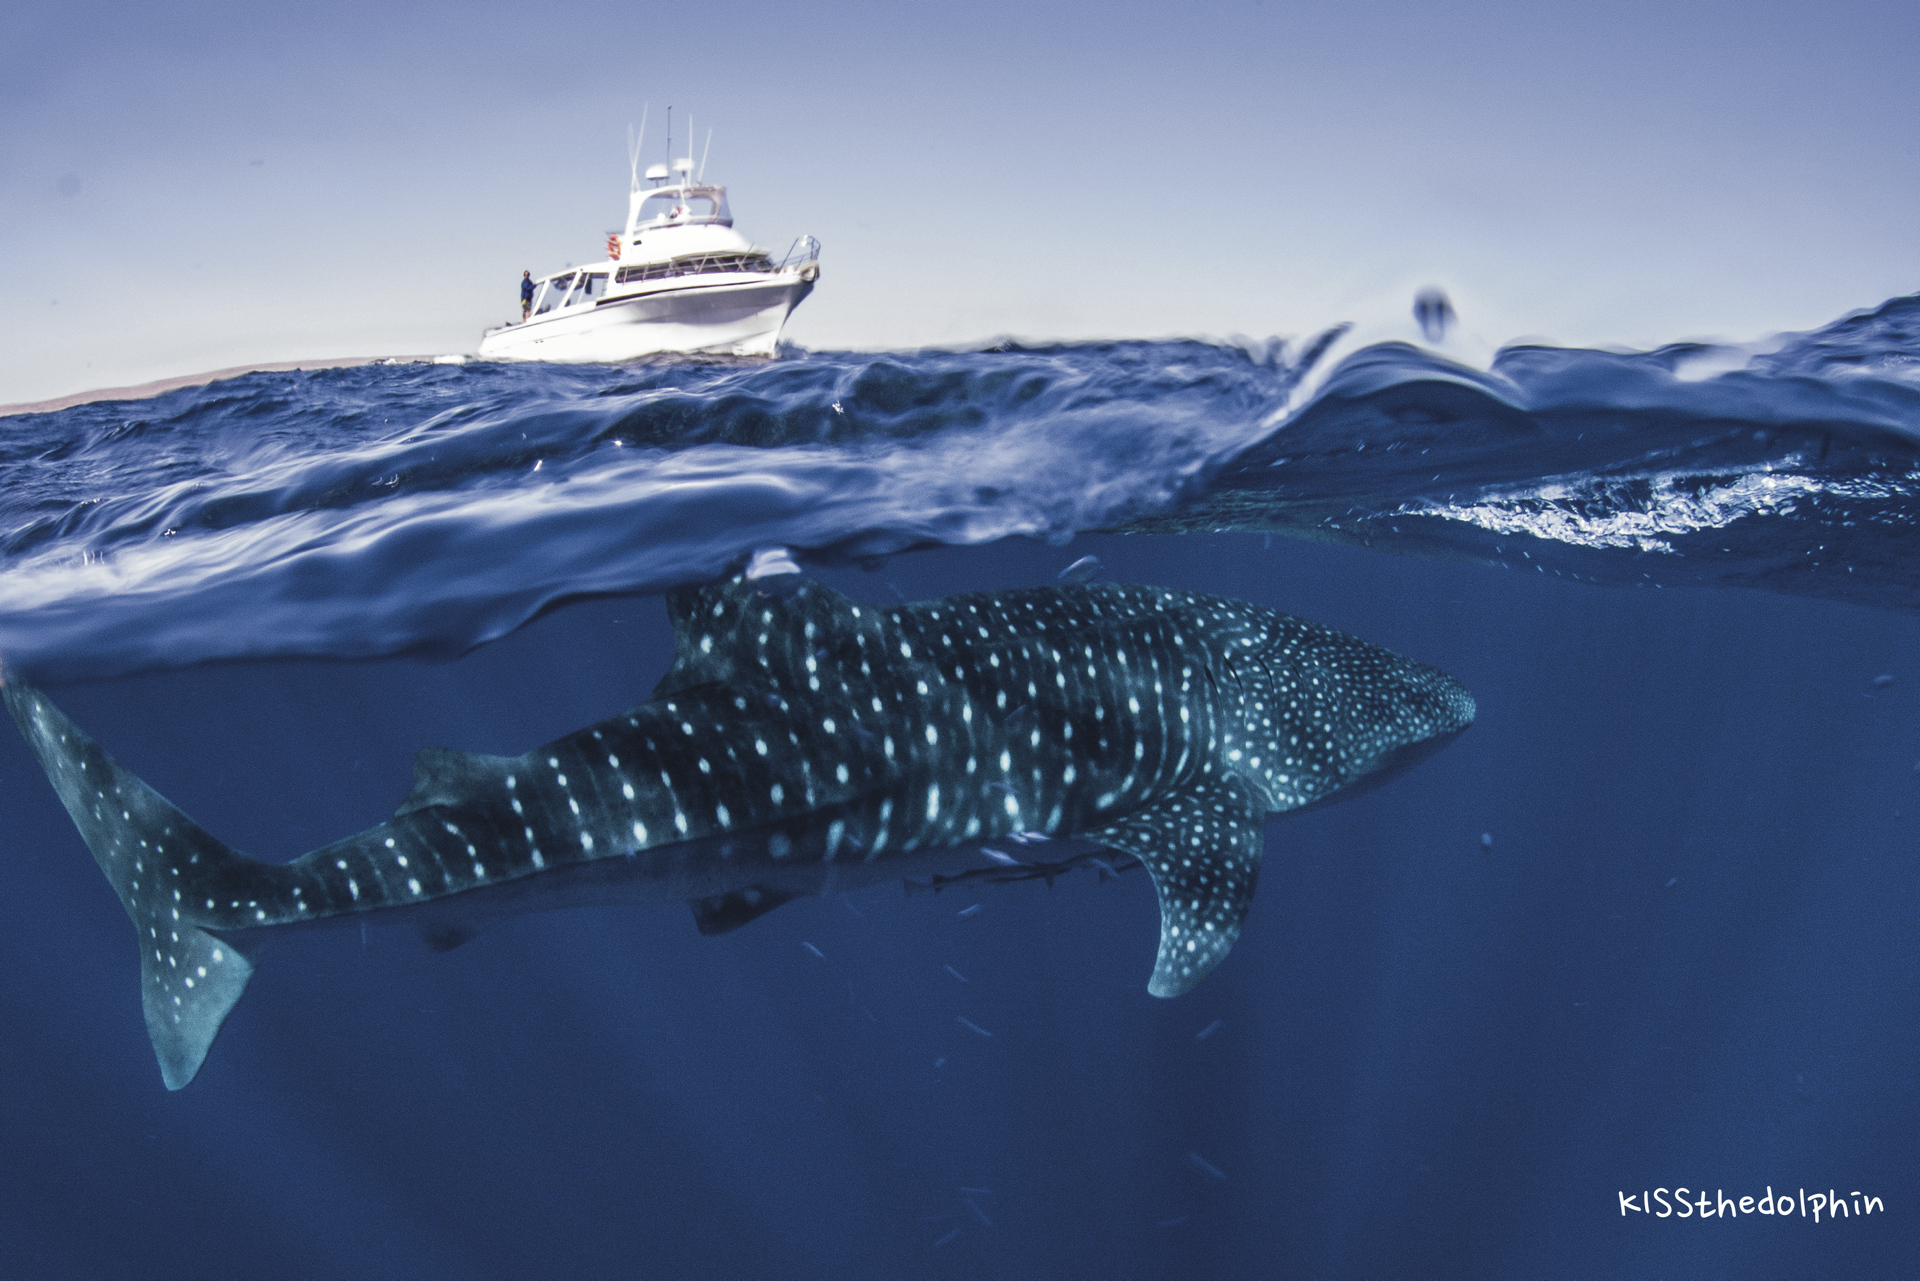 Am Ningaloo Reef ©KISSthedolphin